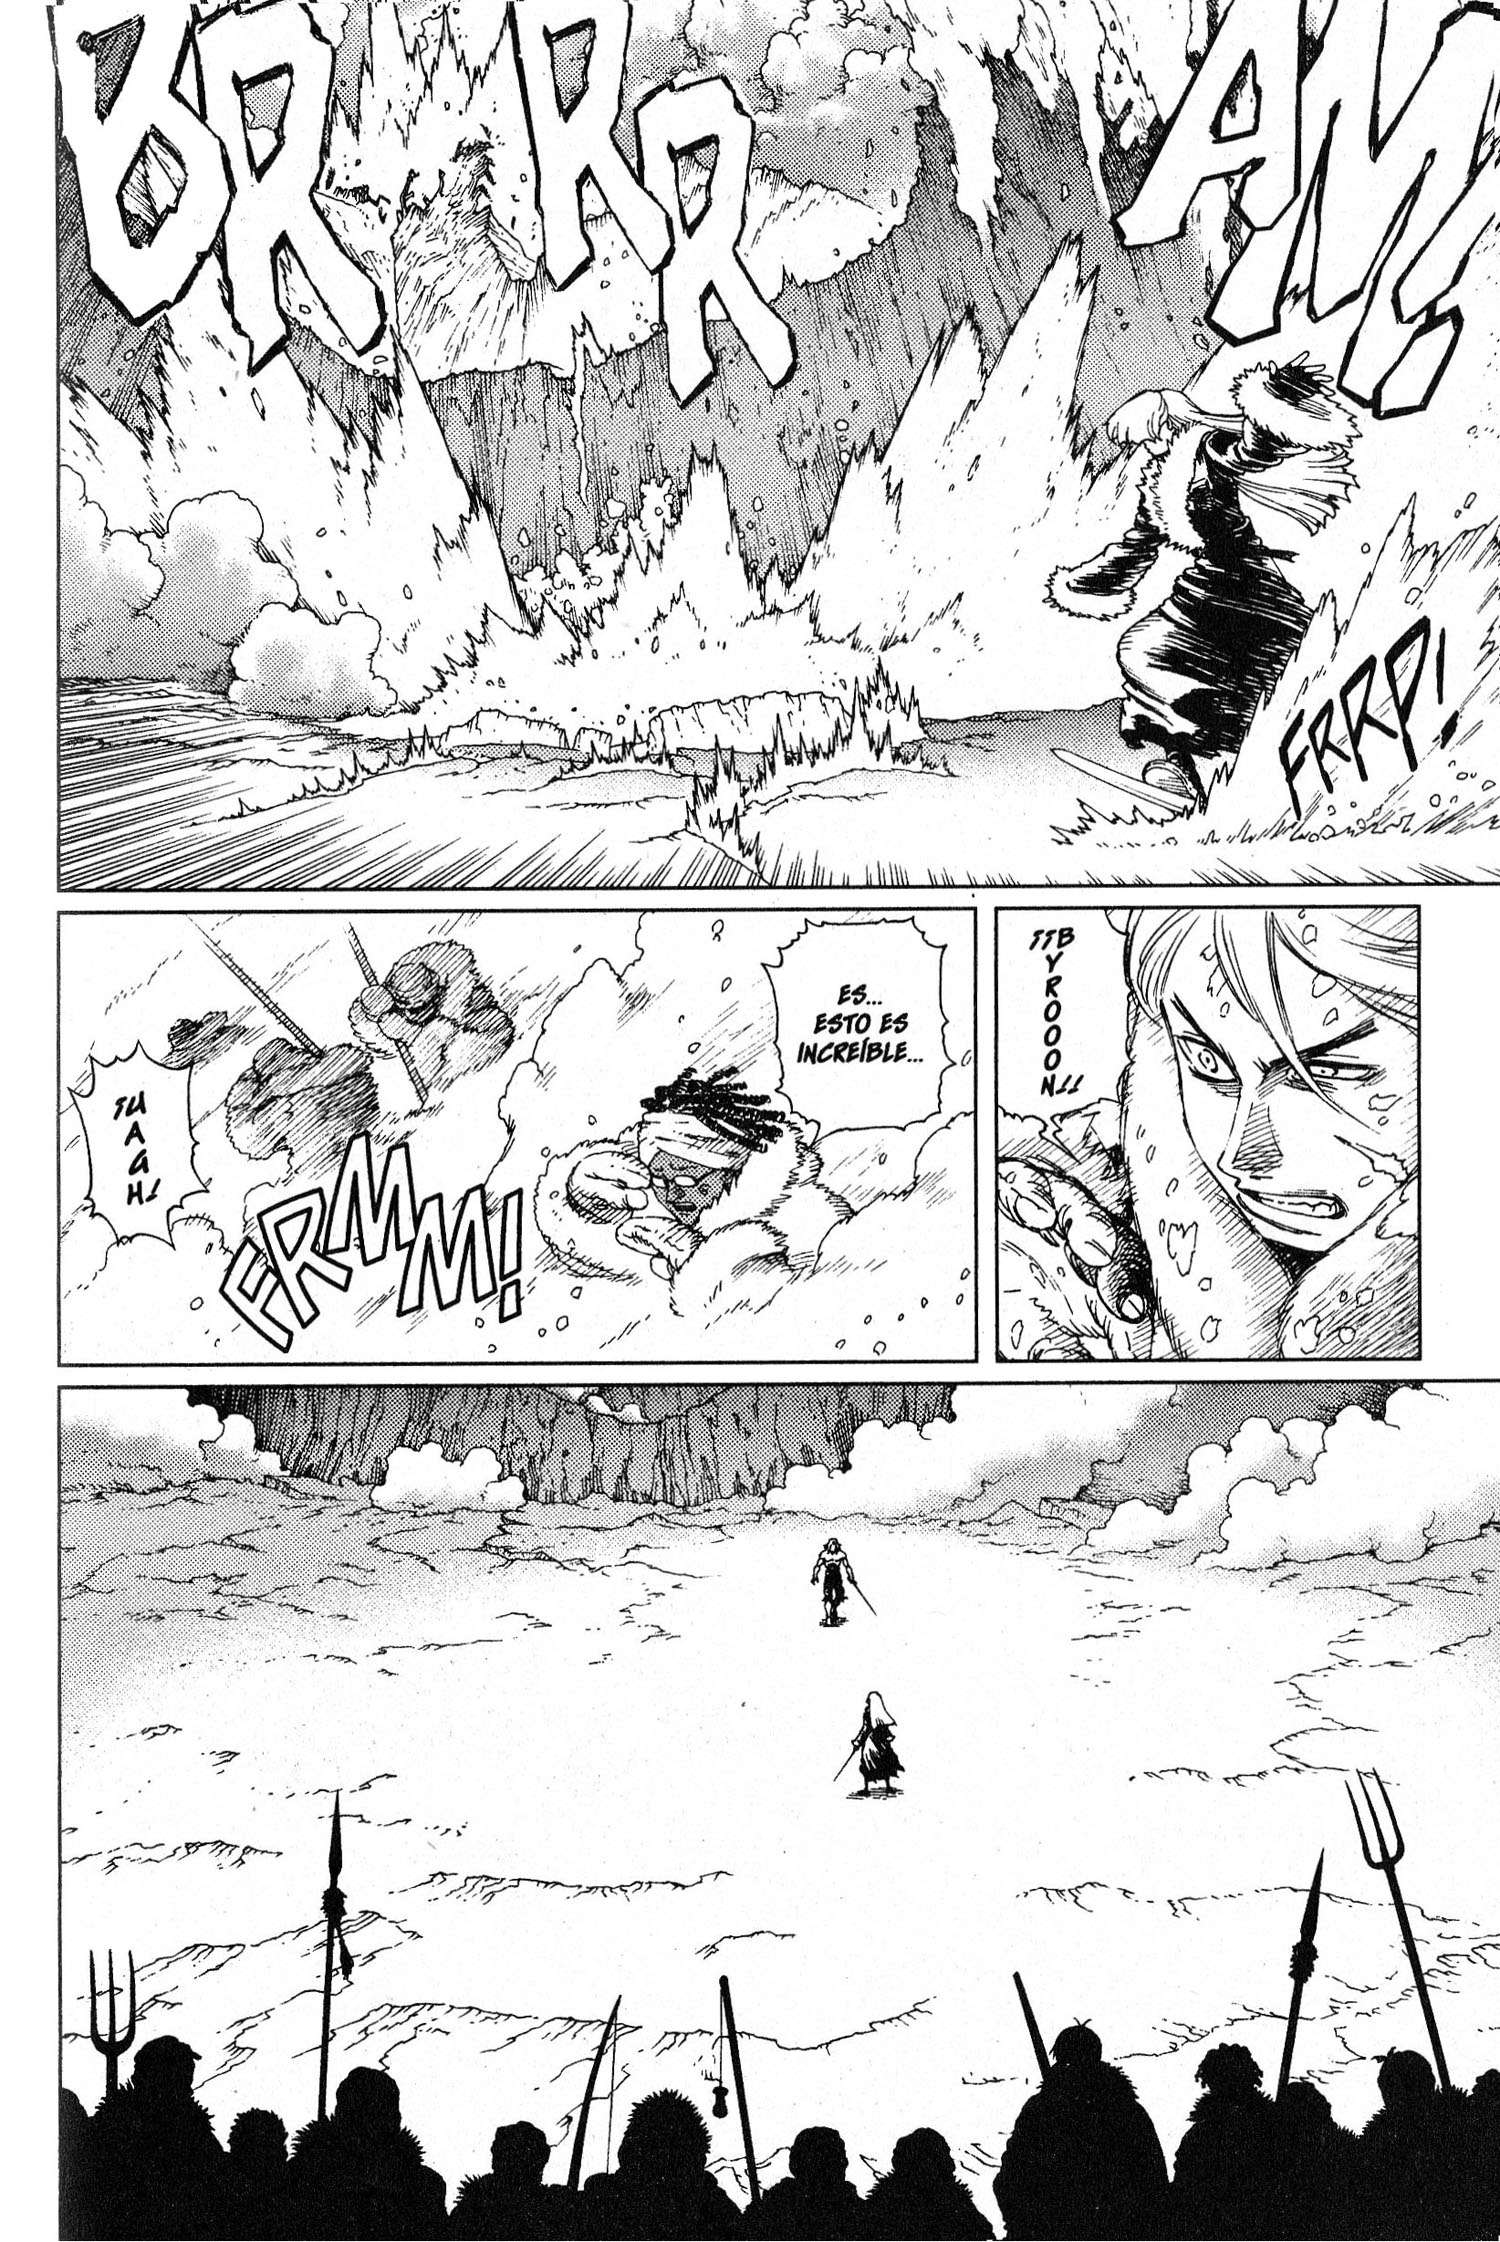 http://c5.ninemanga.com/es_manga/pic2/1/15873/523583/eb1ffafa8204bf7358e1c2d9be3726d0.jpg Page 18